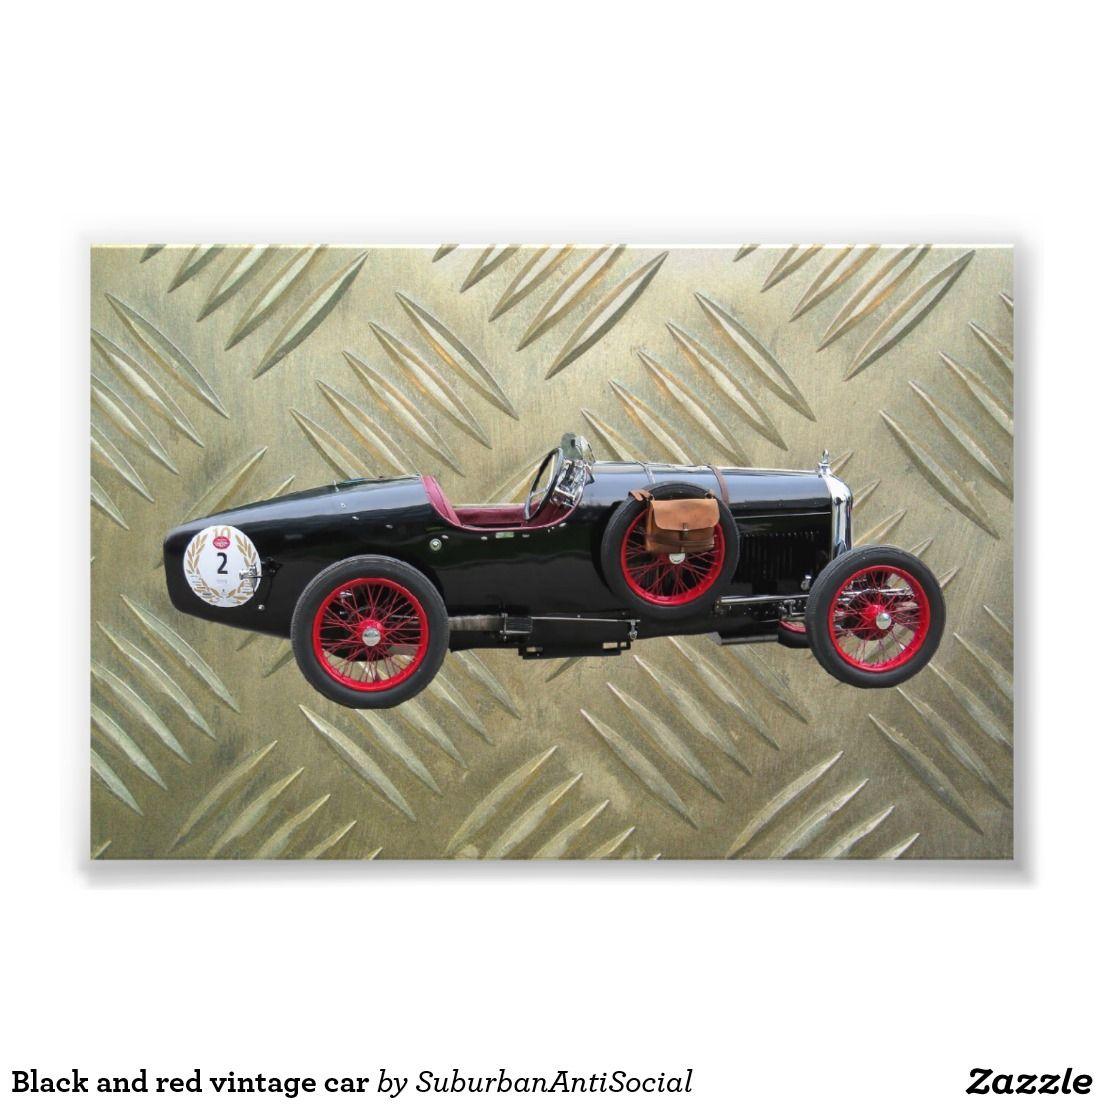 Black and red vintage car photo print